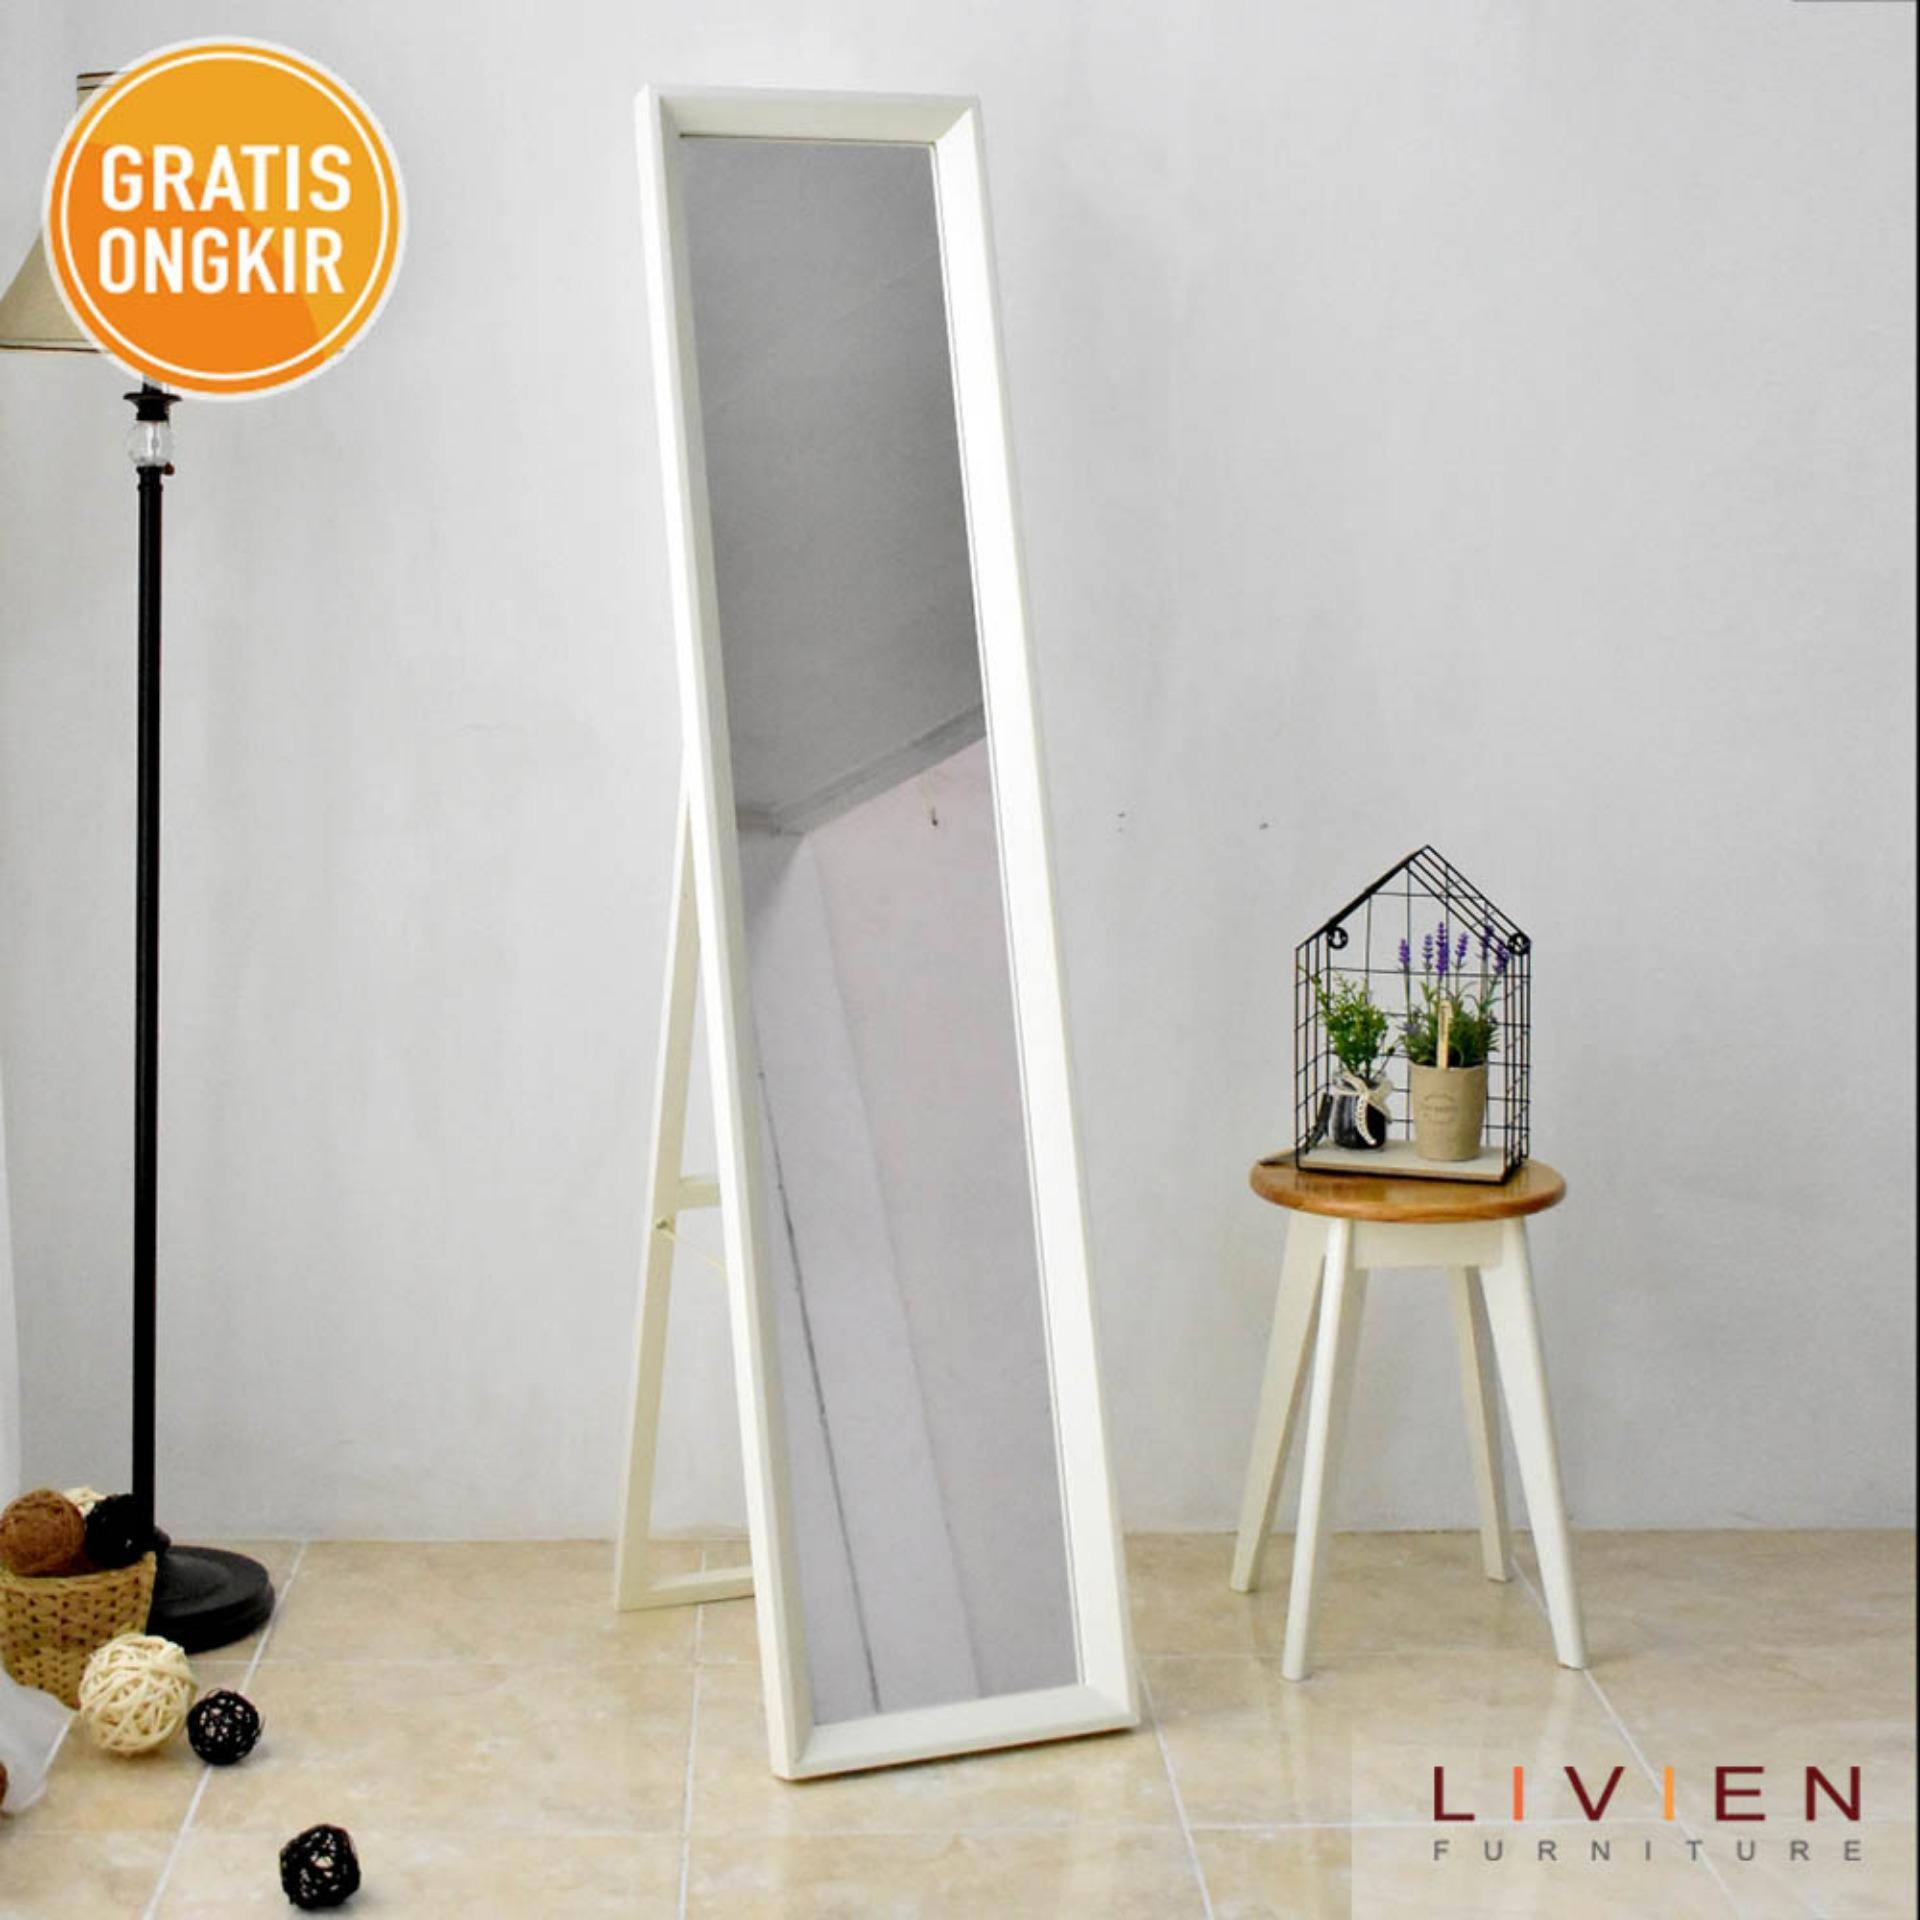 Cermin Dekoratif Rumah Rak Dinding Dapur Alumunium